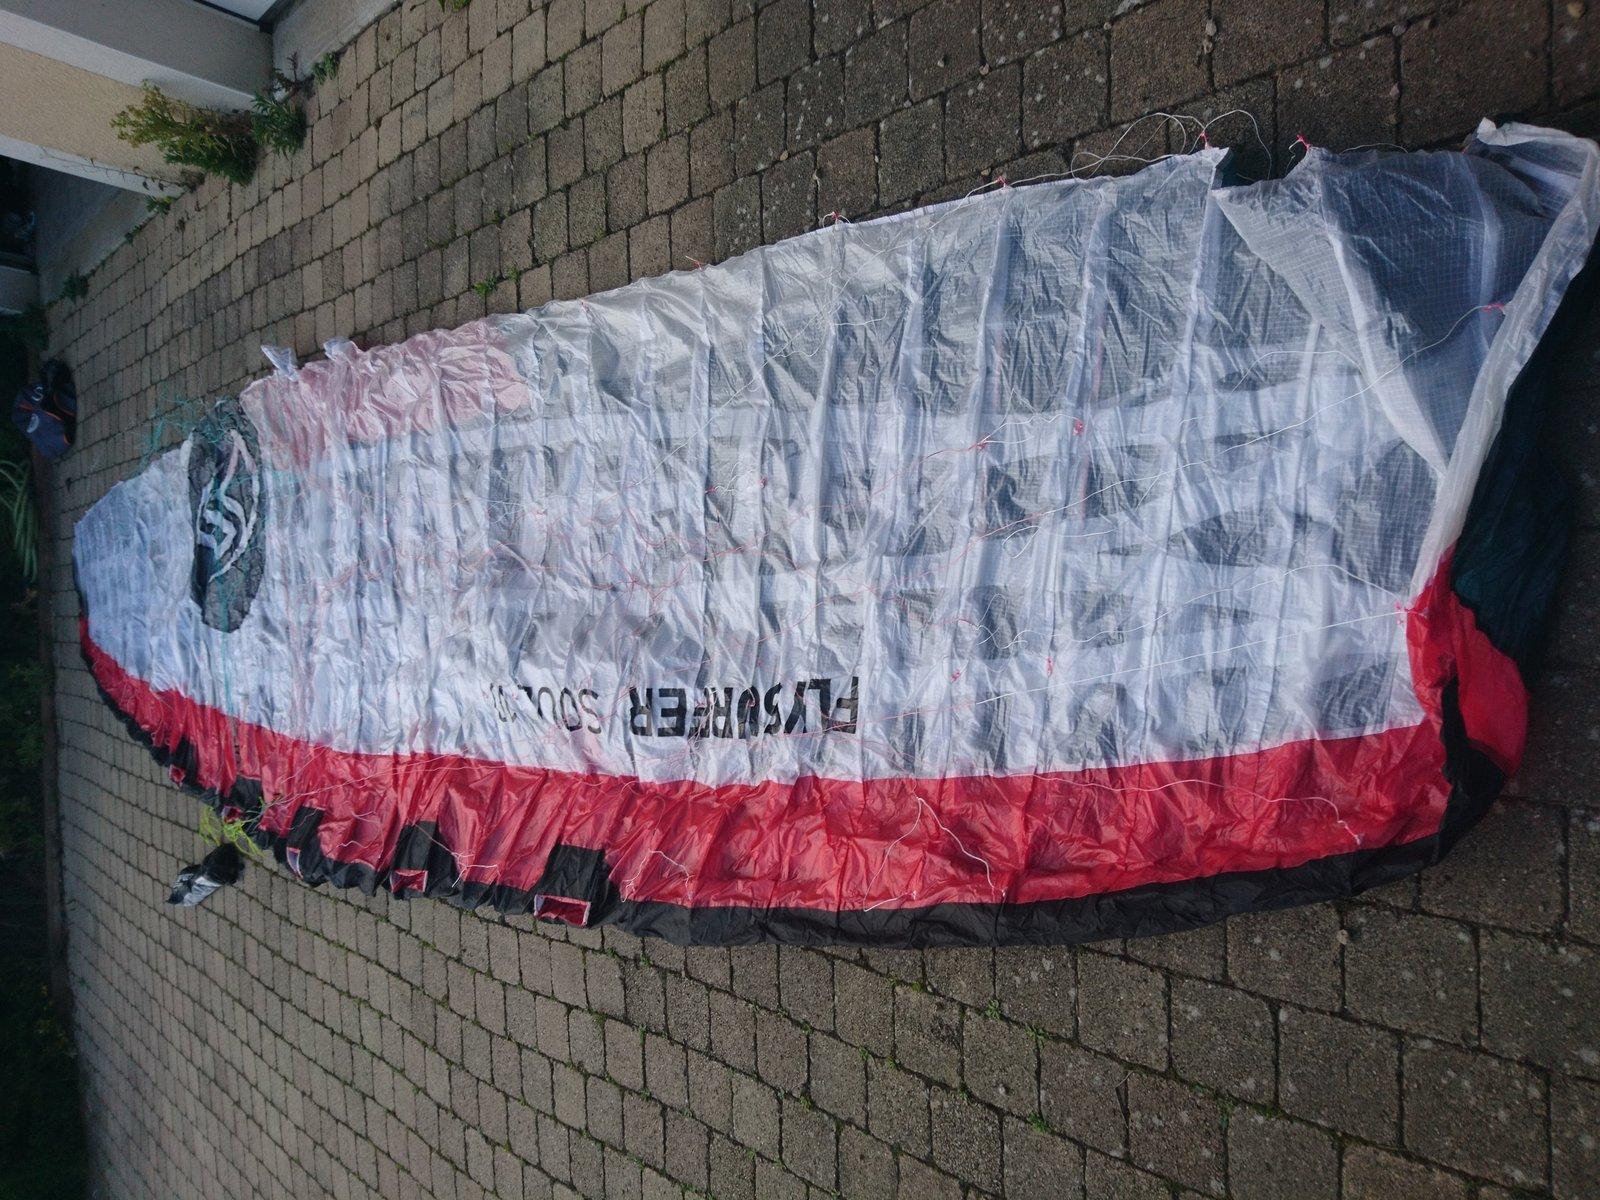 [Vendu] Flysurfer Soul 10m - 1100€ 190513083421850279